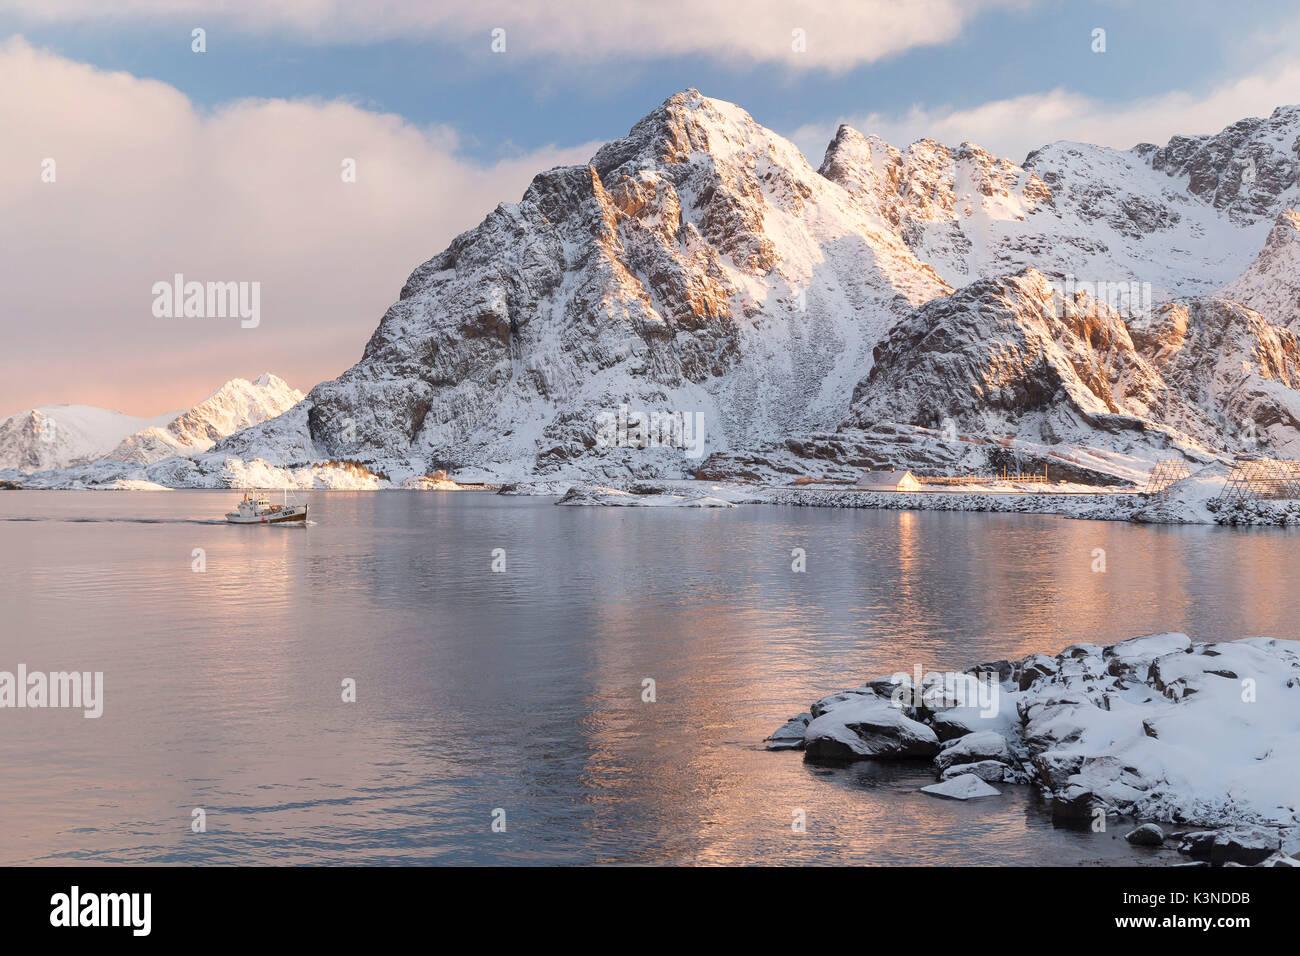 Fishing boat sailing through the icy waters of Henningsvær Fishing village, Lofoten Islands, Norway - Stock Image